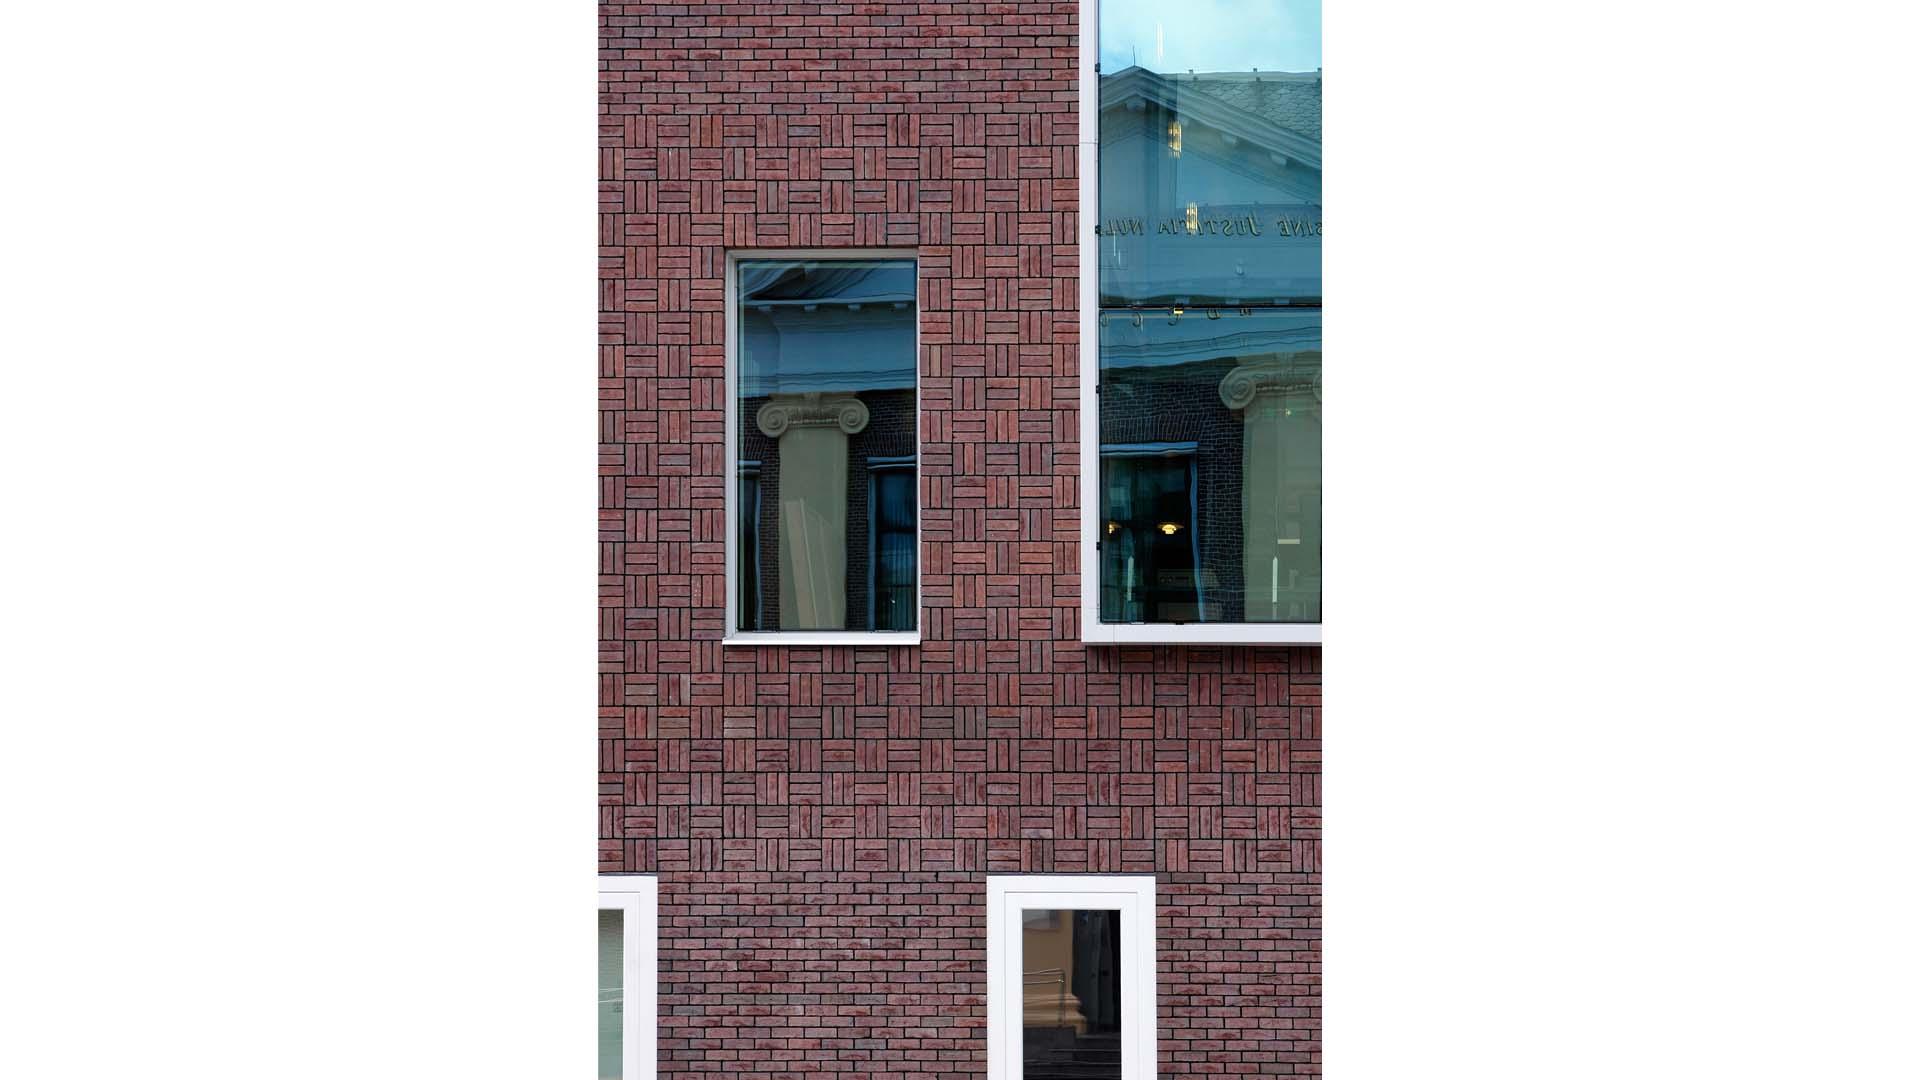 0027_Openbaar Ministerie Brinkstraat Assen_03